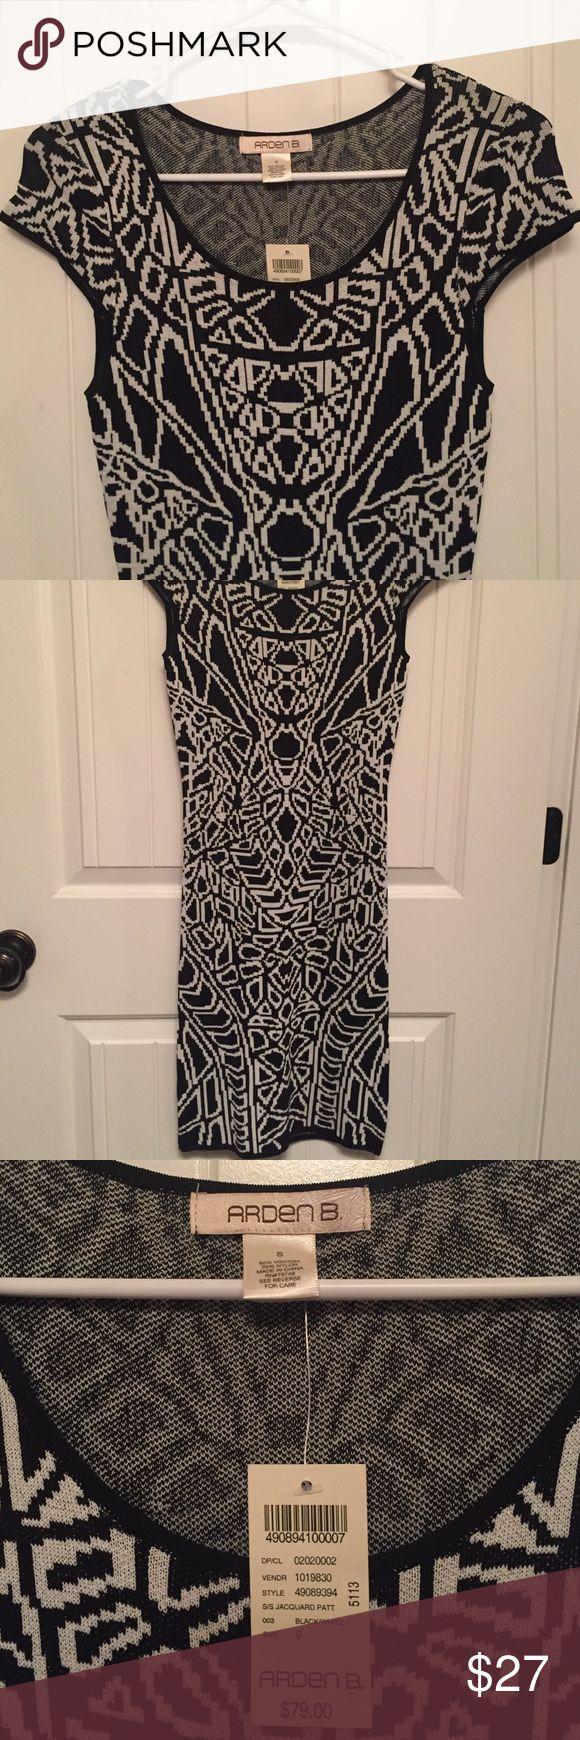 Arden B bodycon dress Knee length black and white patterned bodycon dress that I've never worn! Arden B Dresses Midi